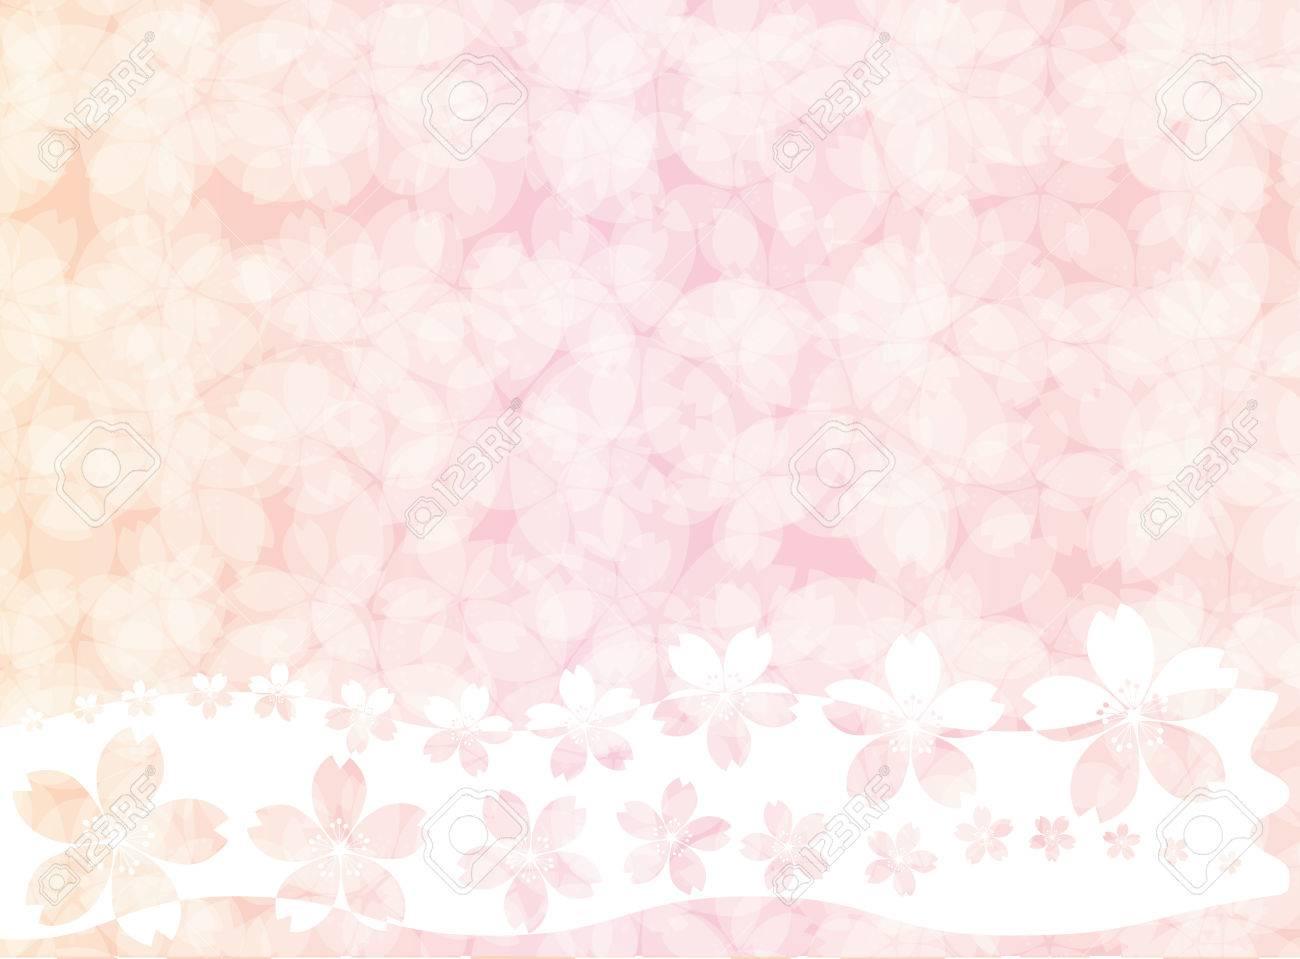 Pink Sakura Blossom Wallpaper Or Background